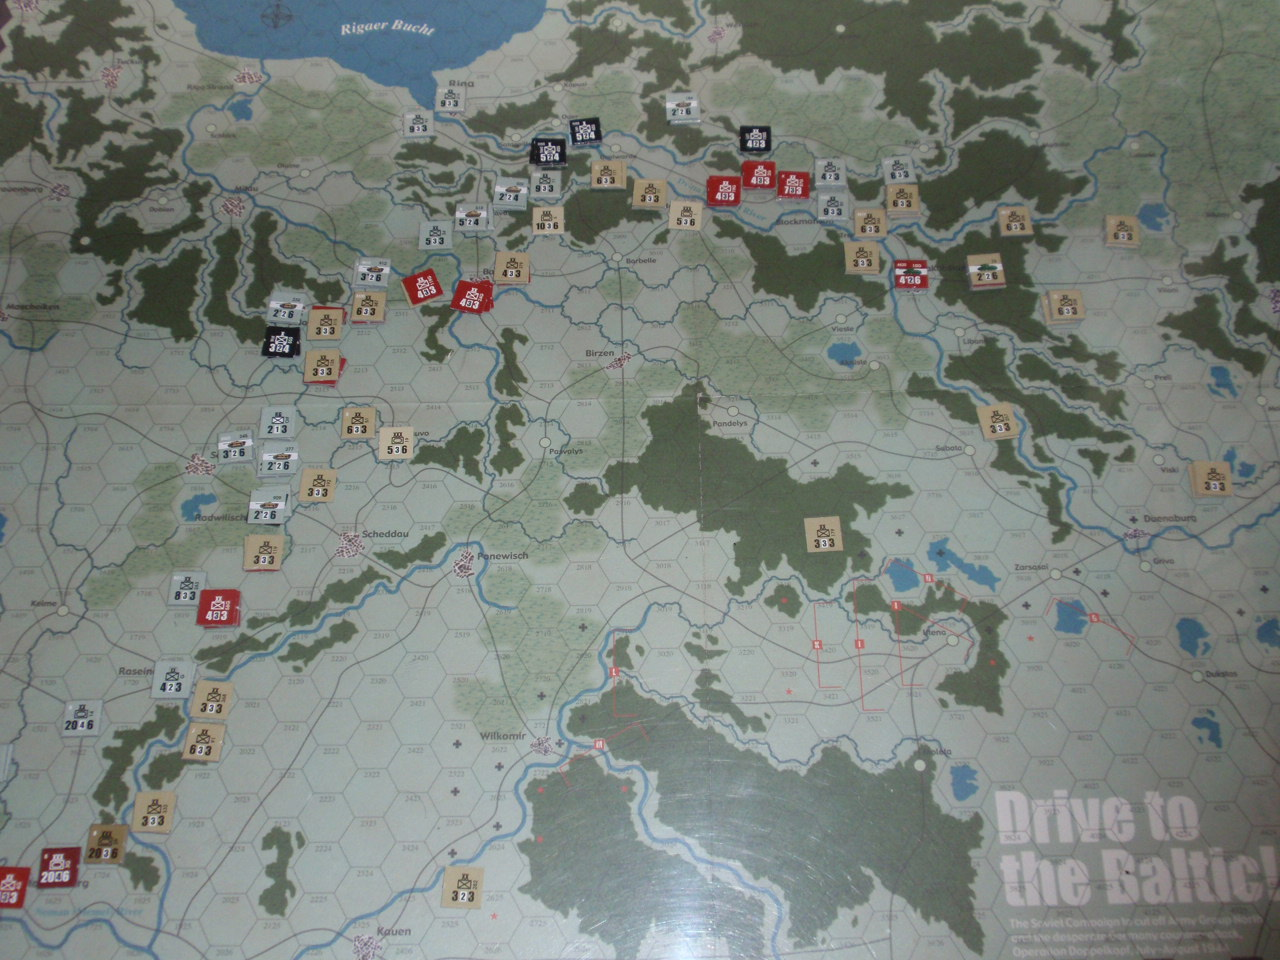 MIH/CMJ「Drive to the Baltic!」をソロプレイ④_b0162202_20223947.jpg